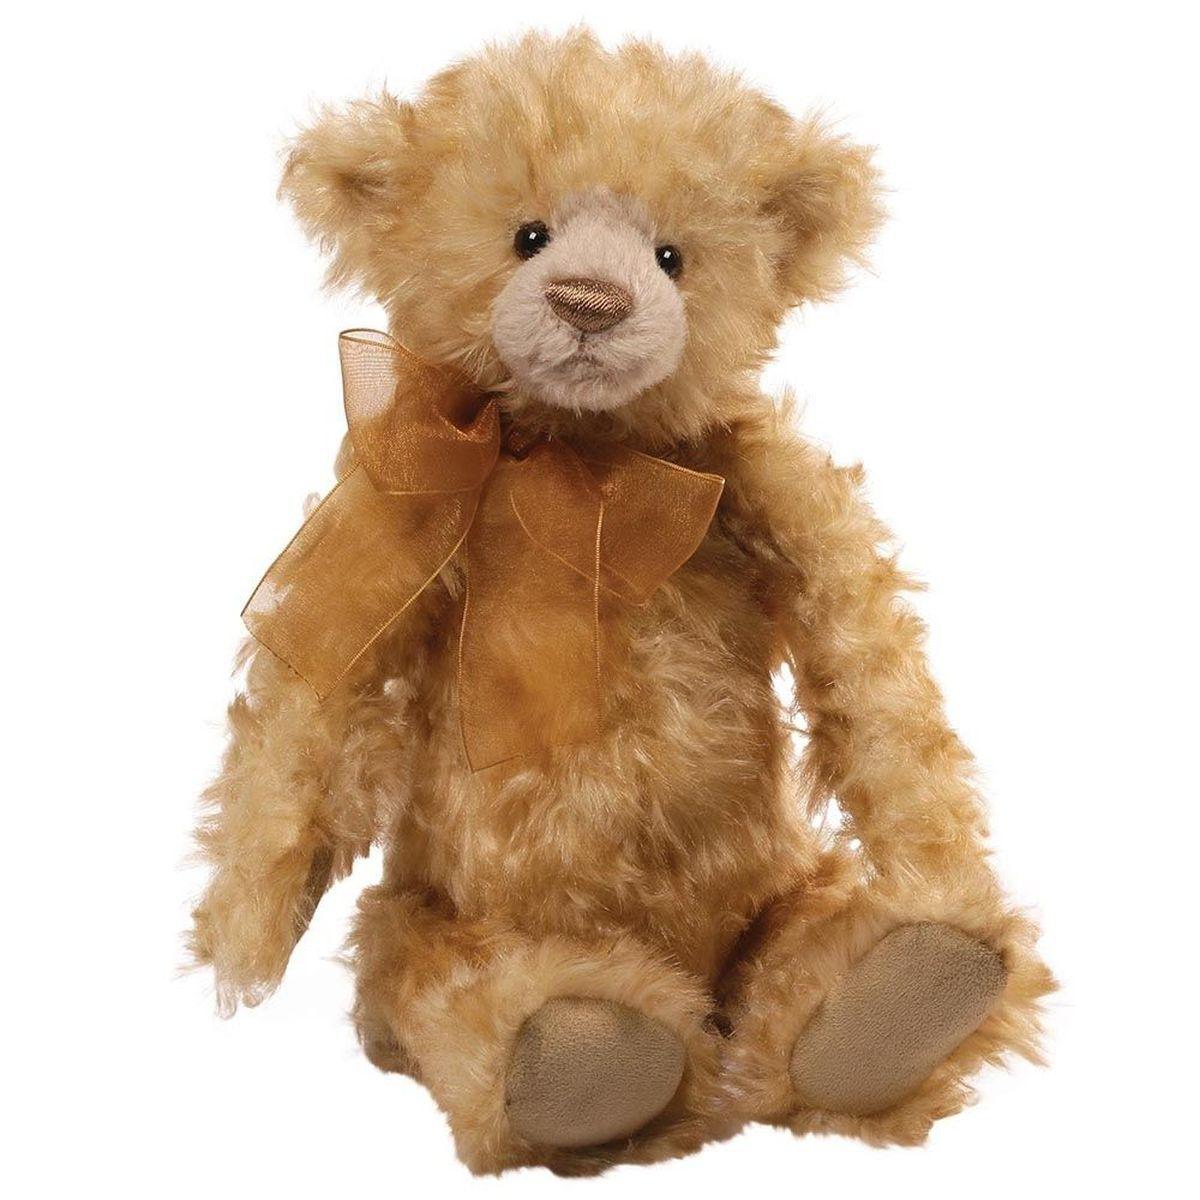 Gund Мягкая игрушка Braden Bear 33 см мягкая игрушка paddington bear